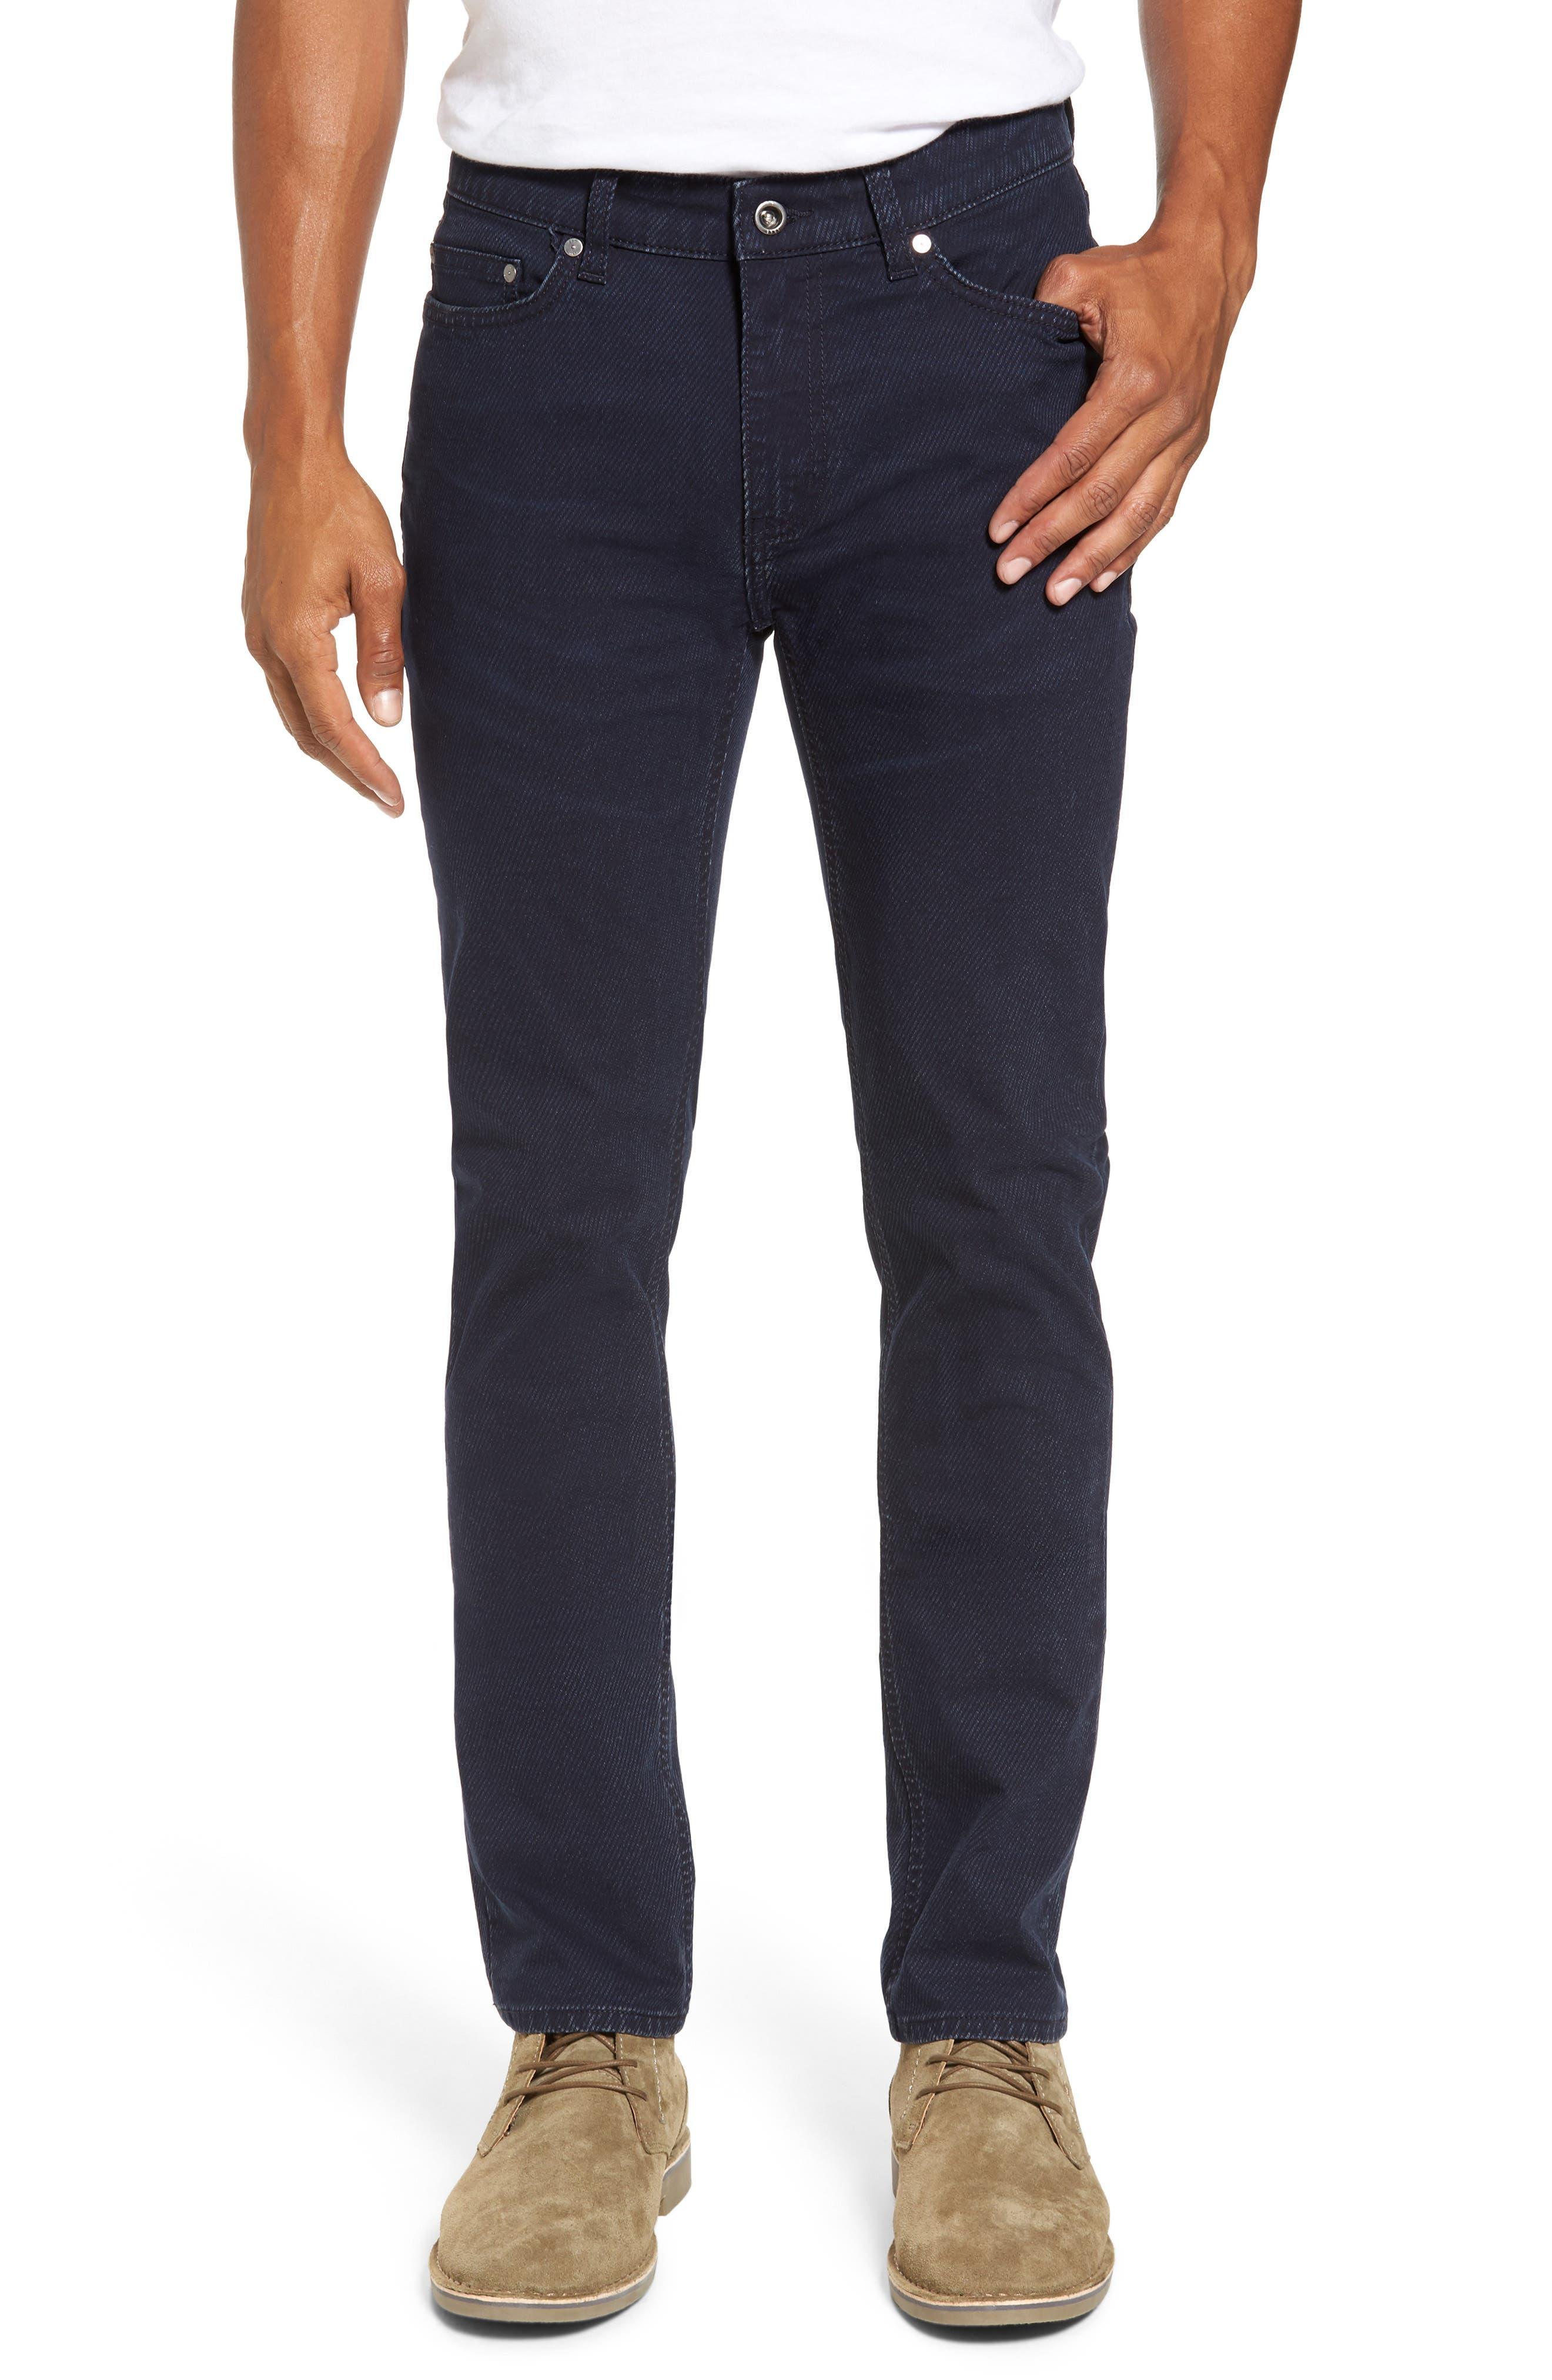 Palmwood Slim Fit Jeans,                             Main thumbnail 1, color,                             411